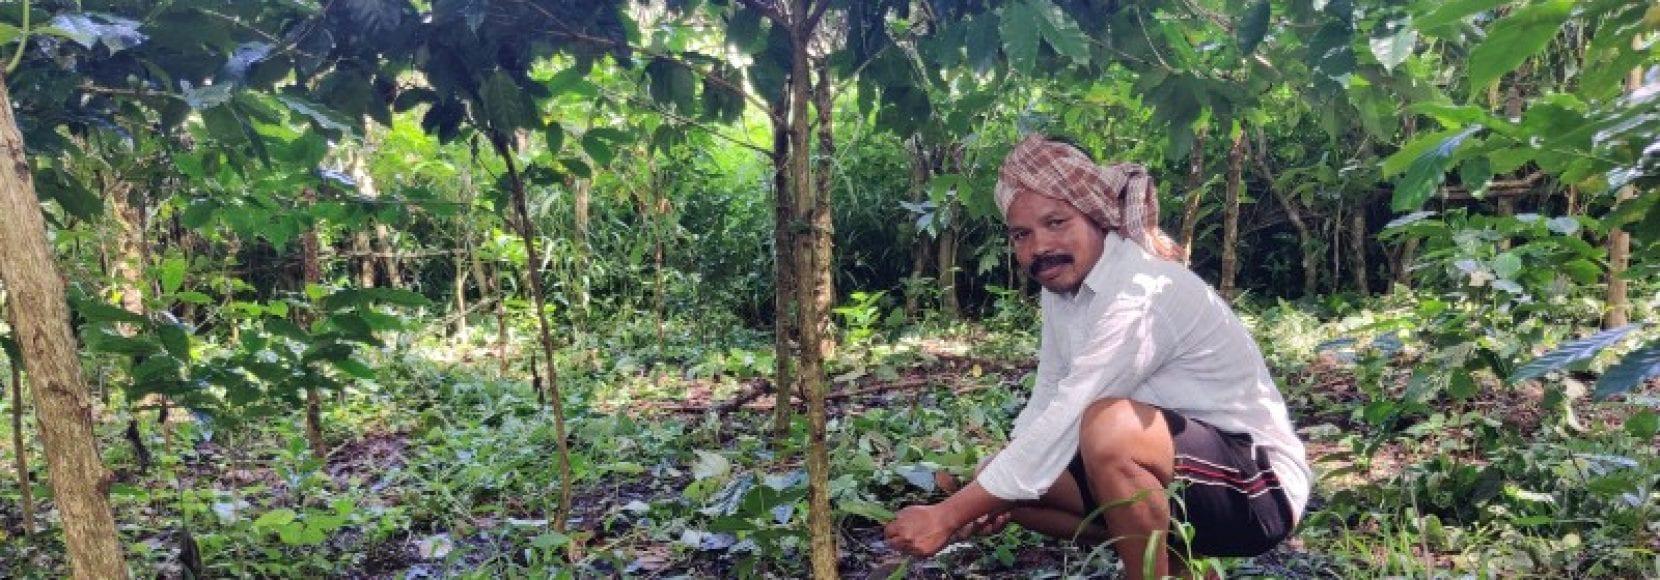 Mottadam Jogiraju tends to his farm in Visakhapatnam district, India